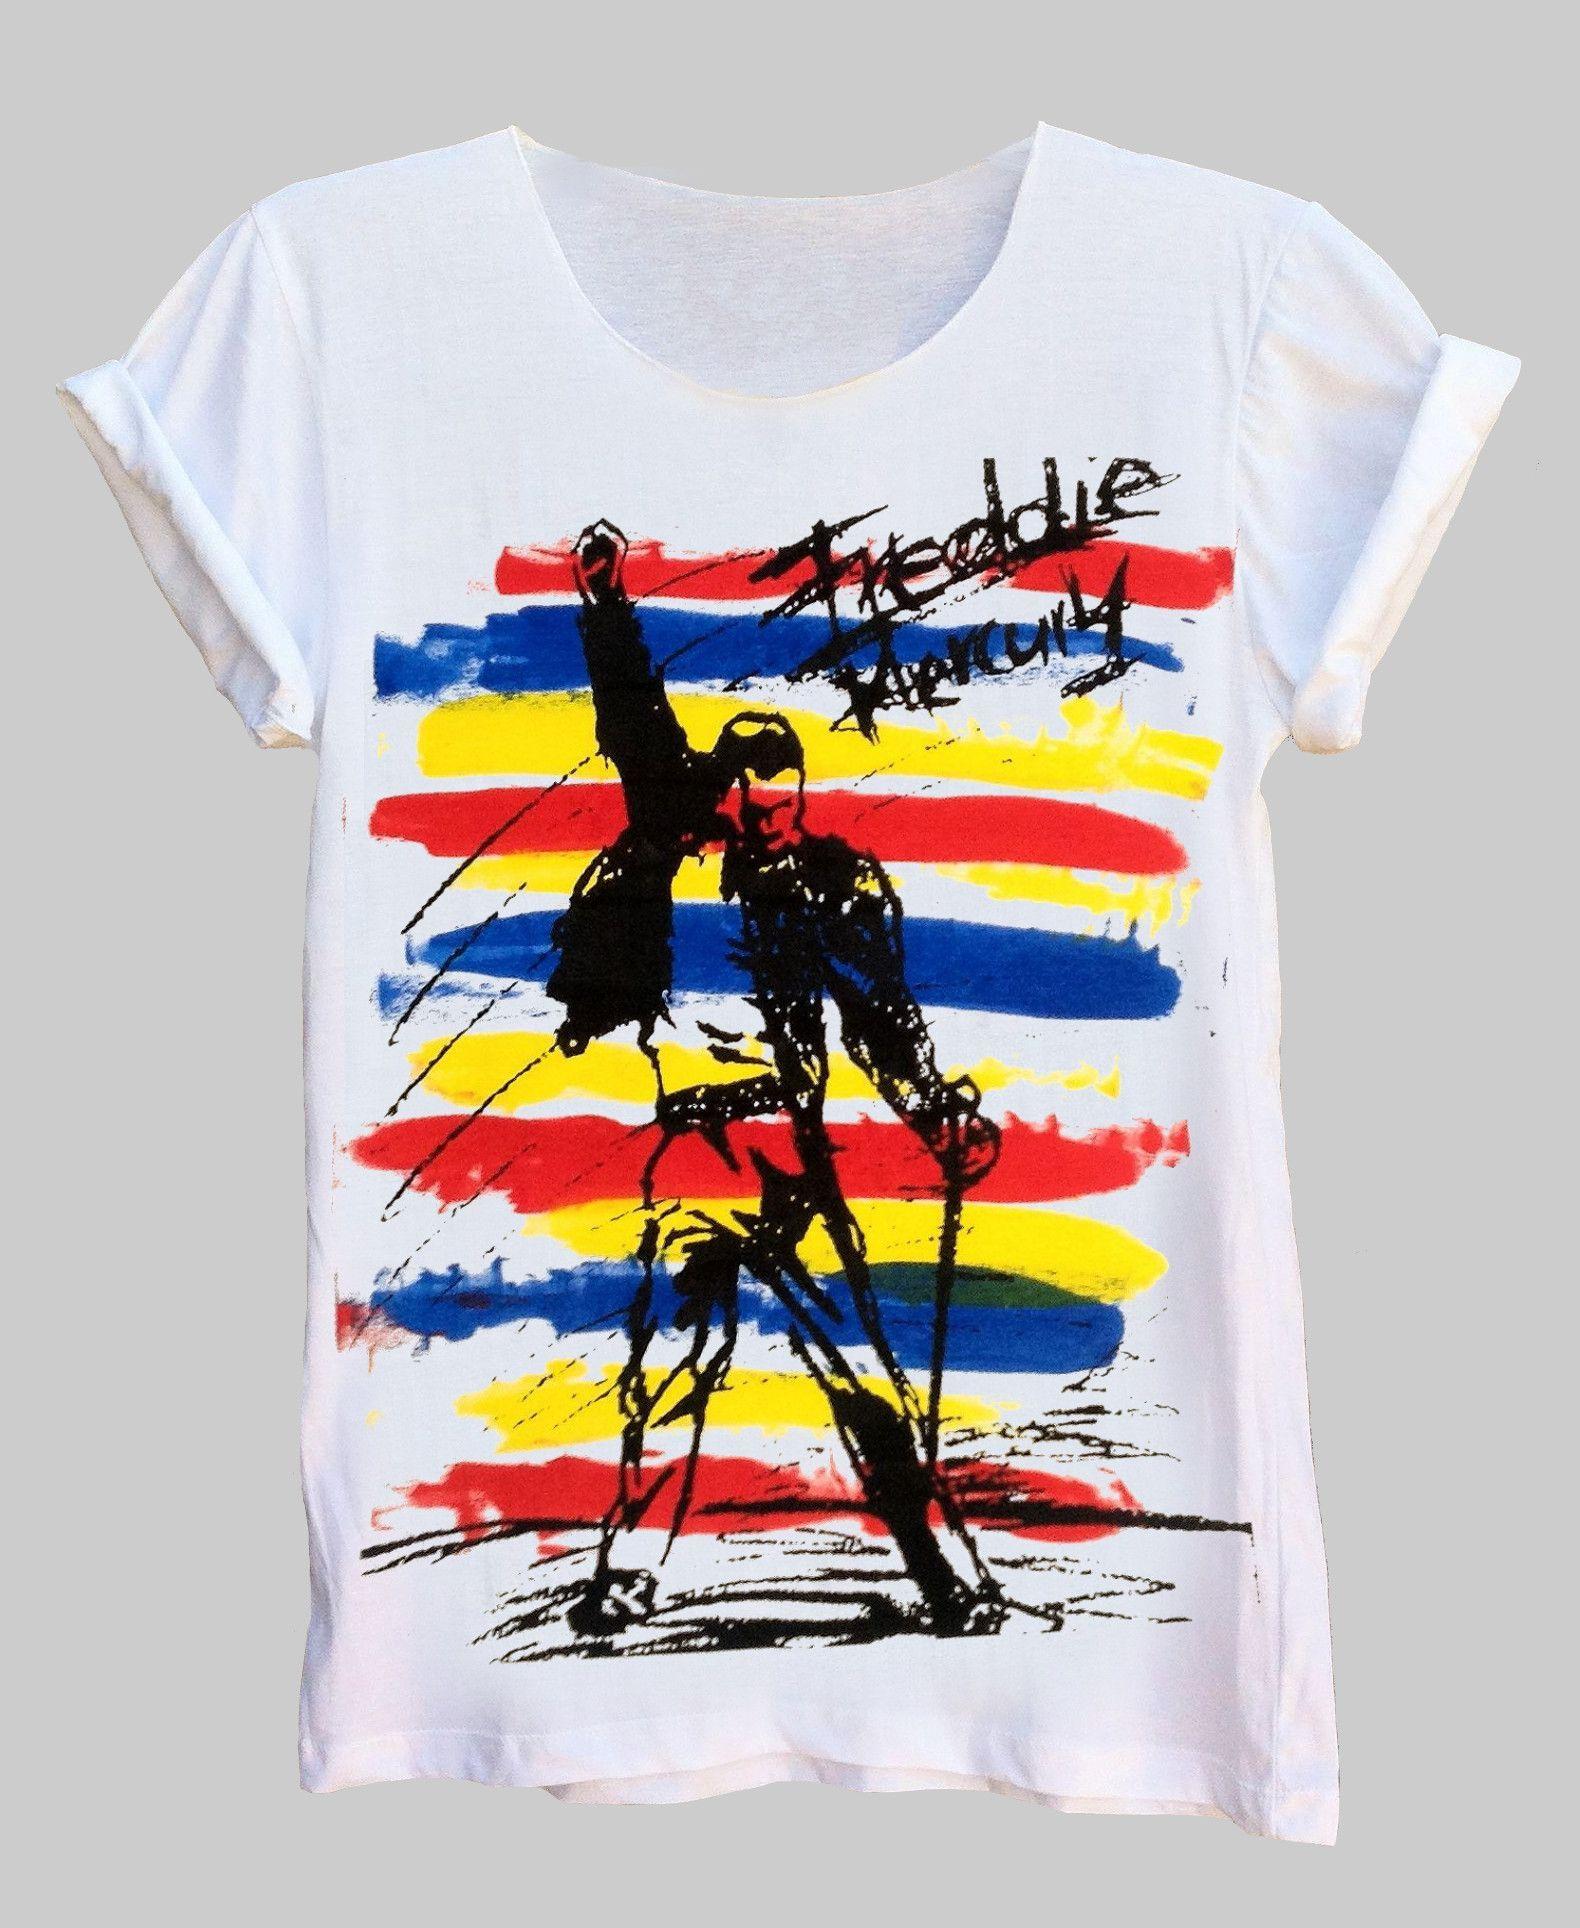 808bf568f1364e Freddie Mercury Sketch Fine Jersey Unisex White T-Shirt ...